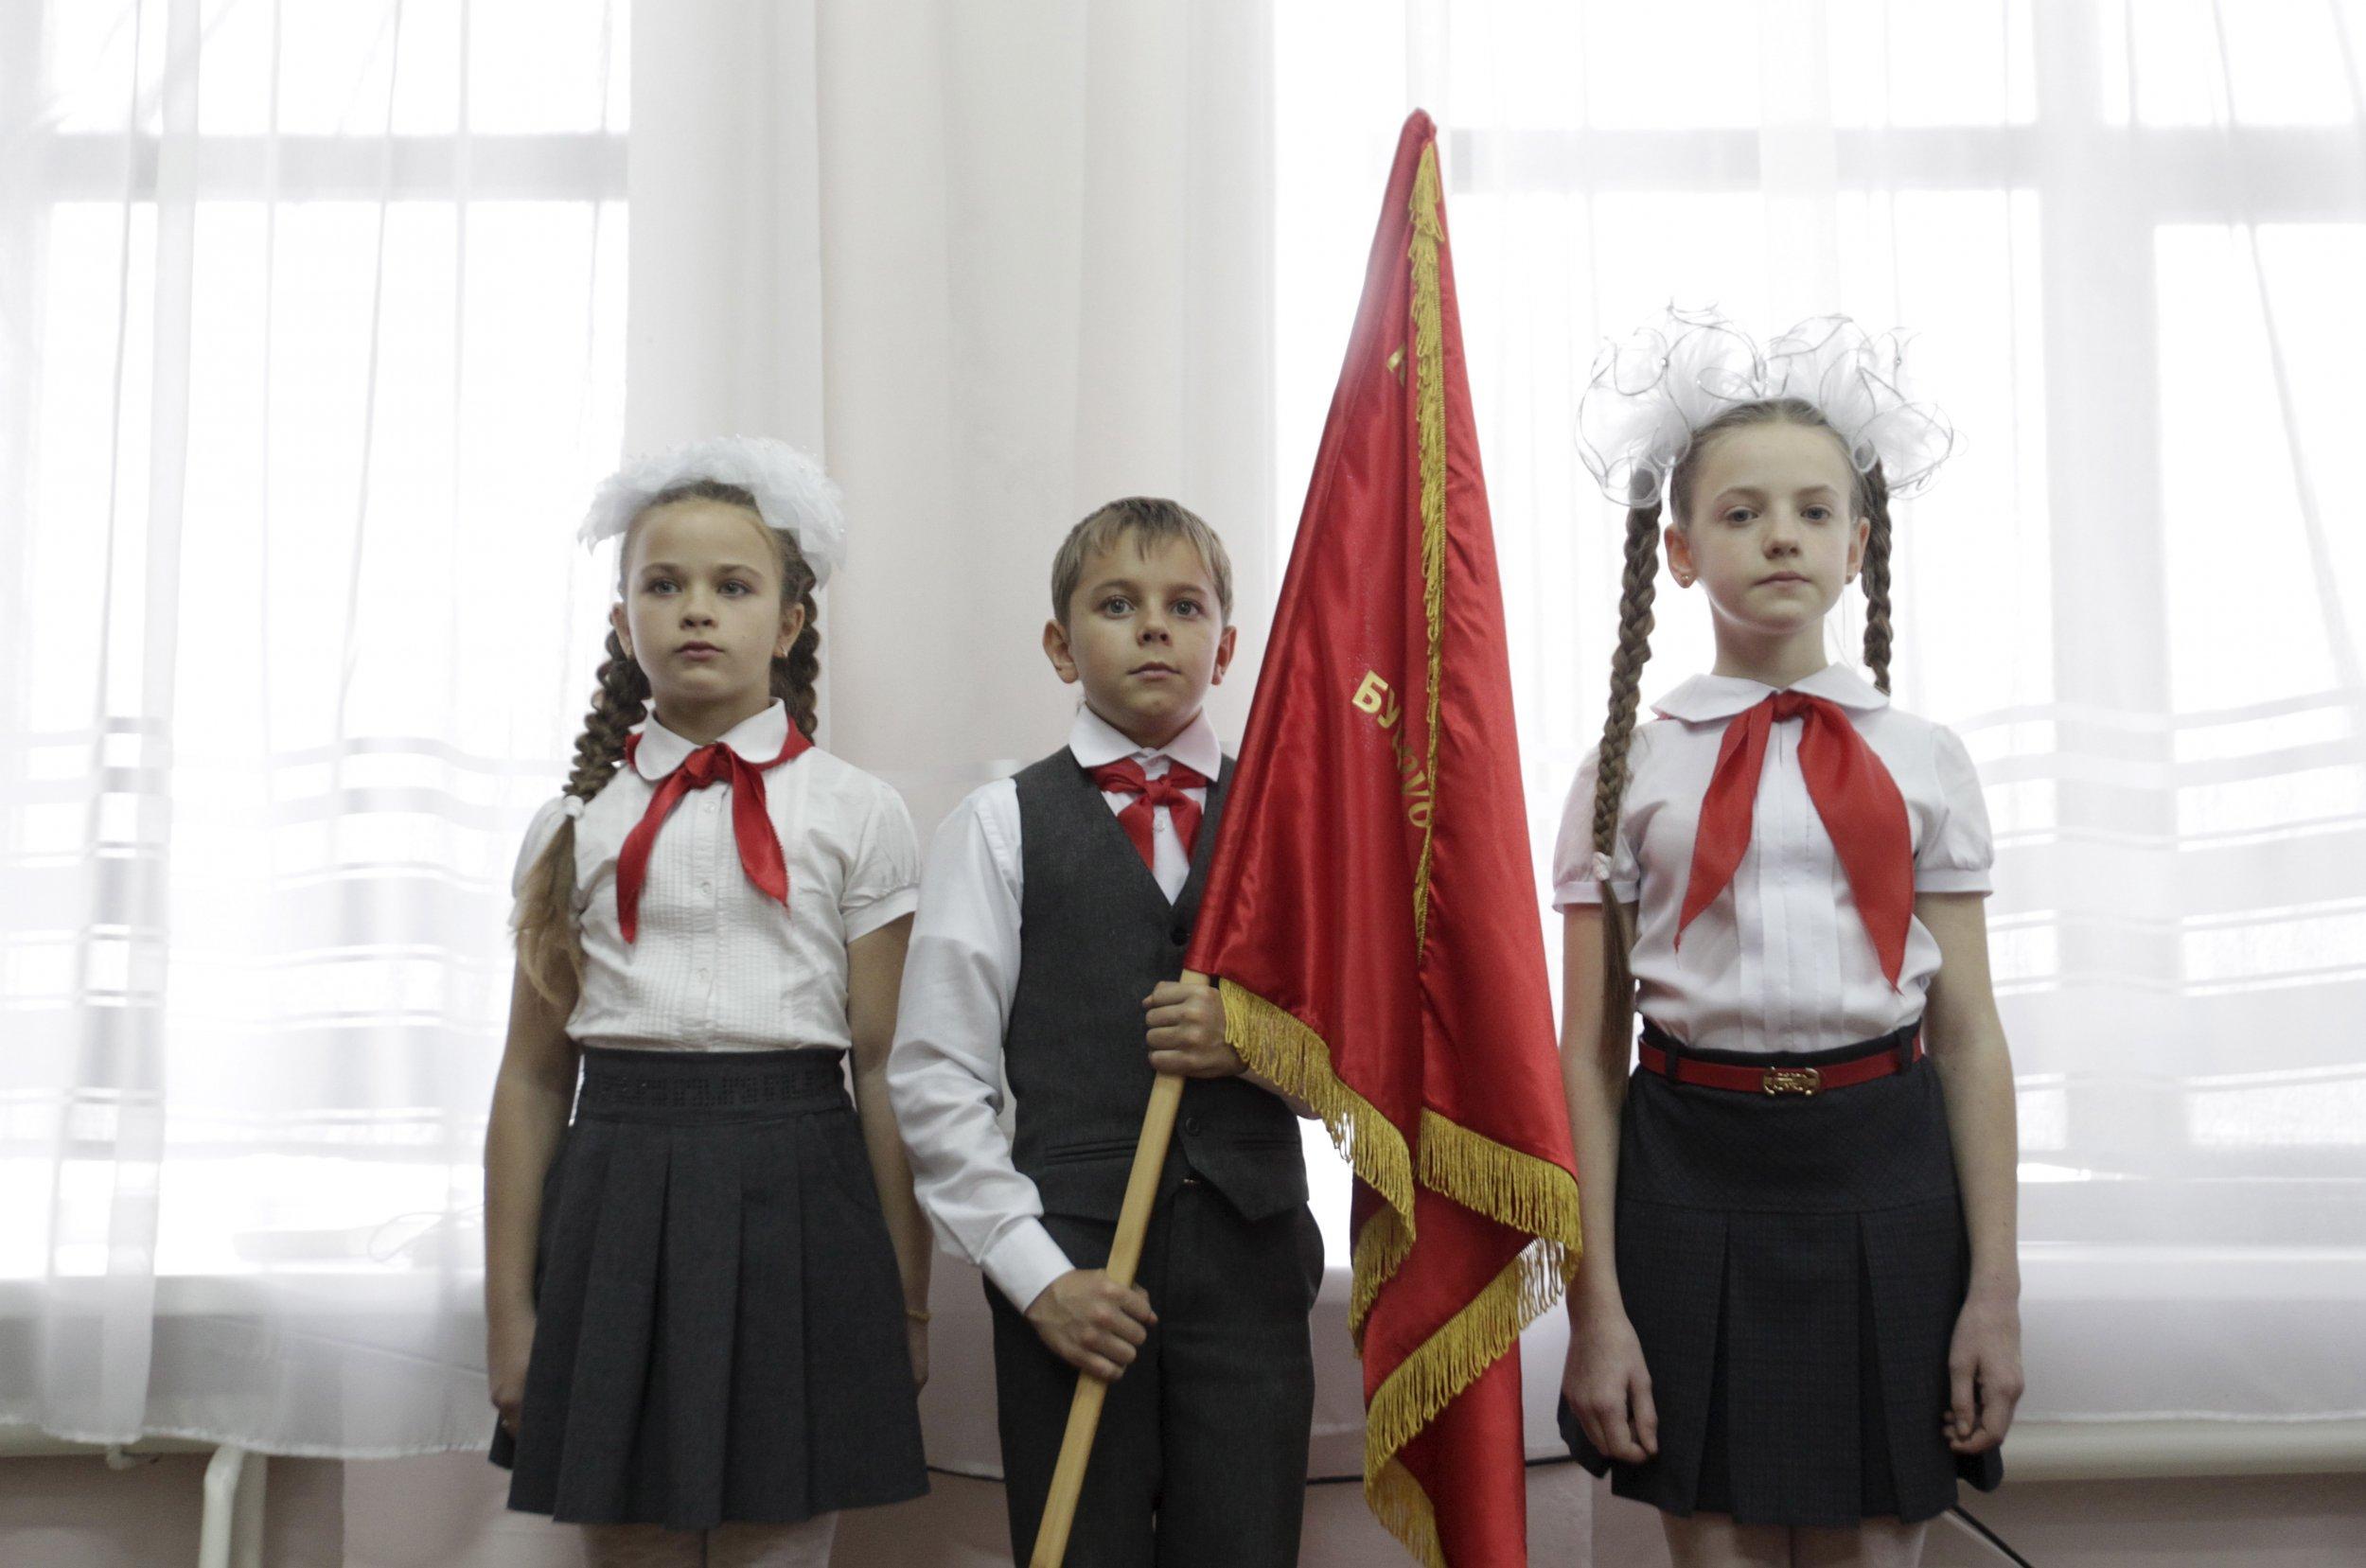 08_12_Communists_01